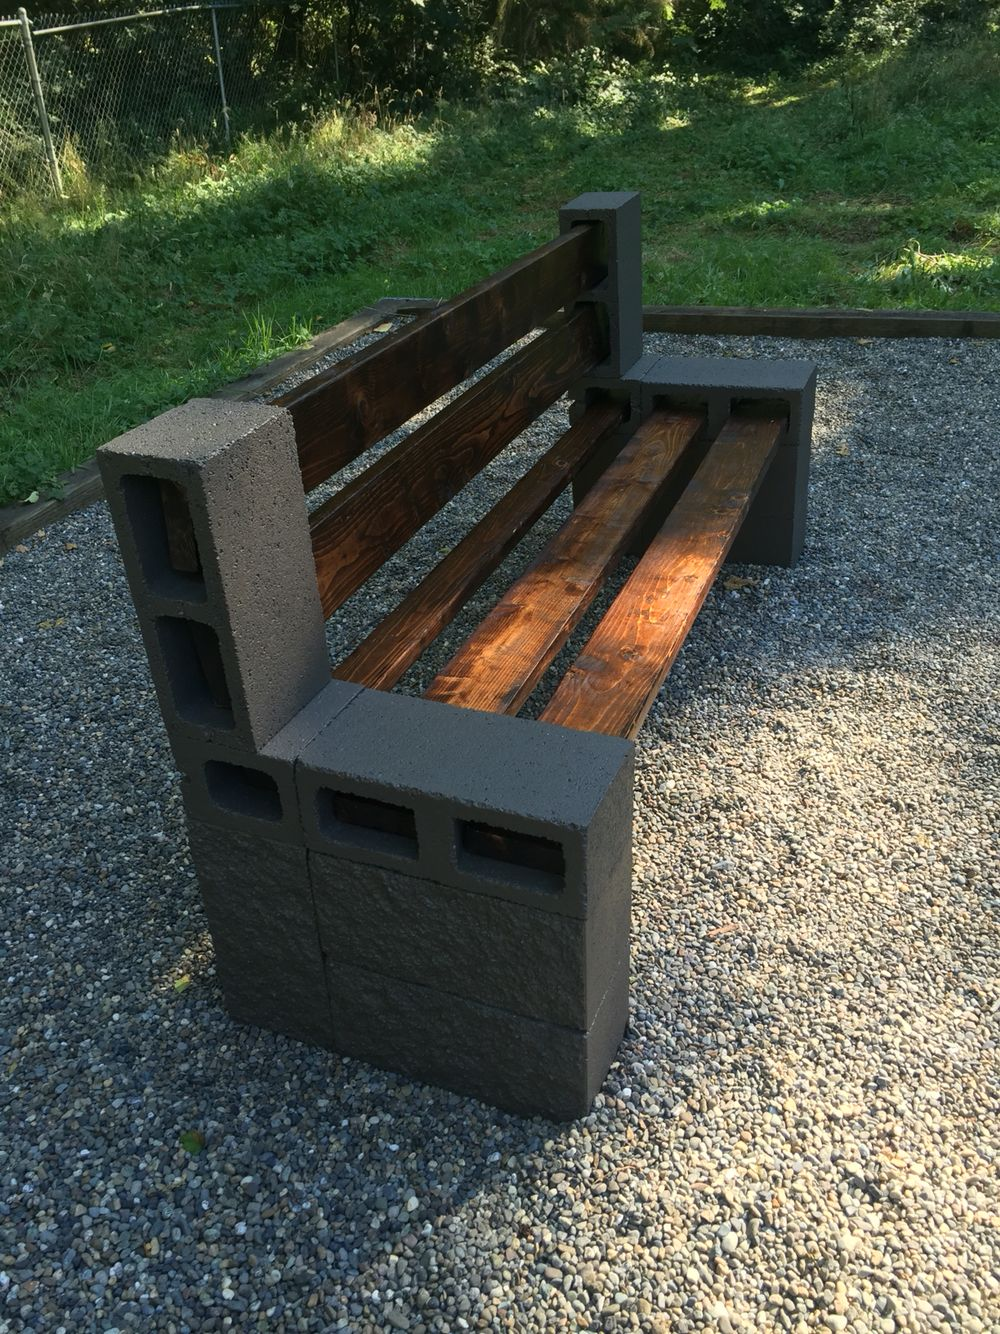 Diy bench Garden furniture design, Diy patio, Diy